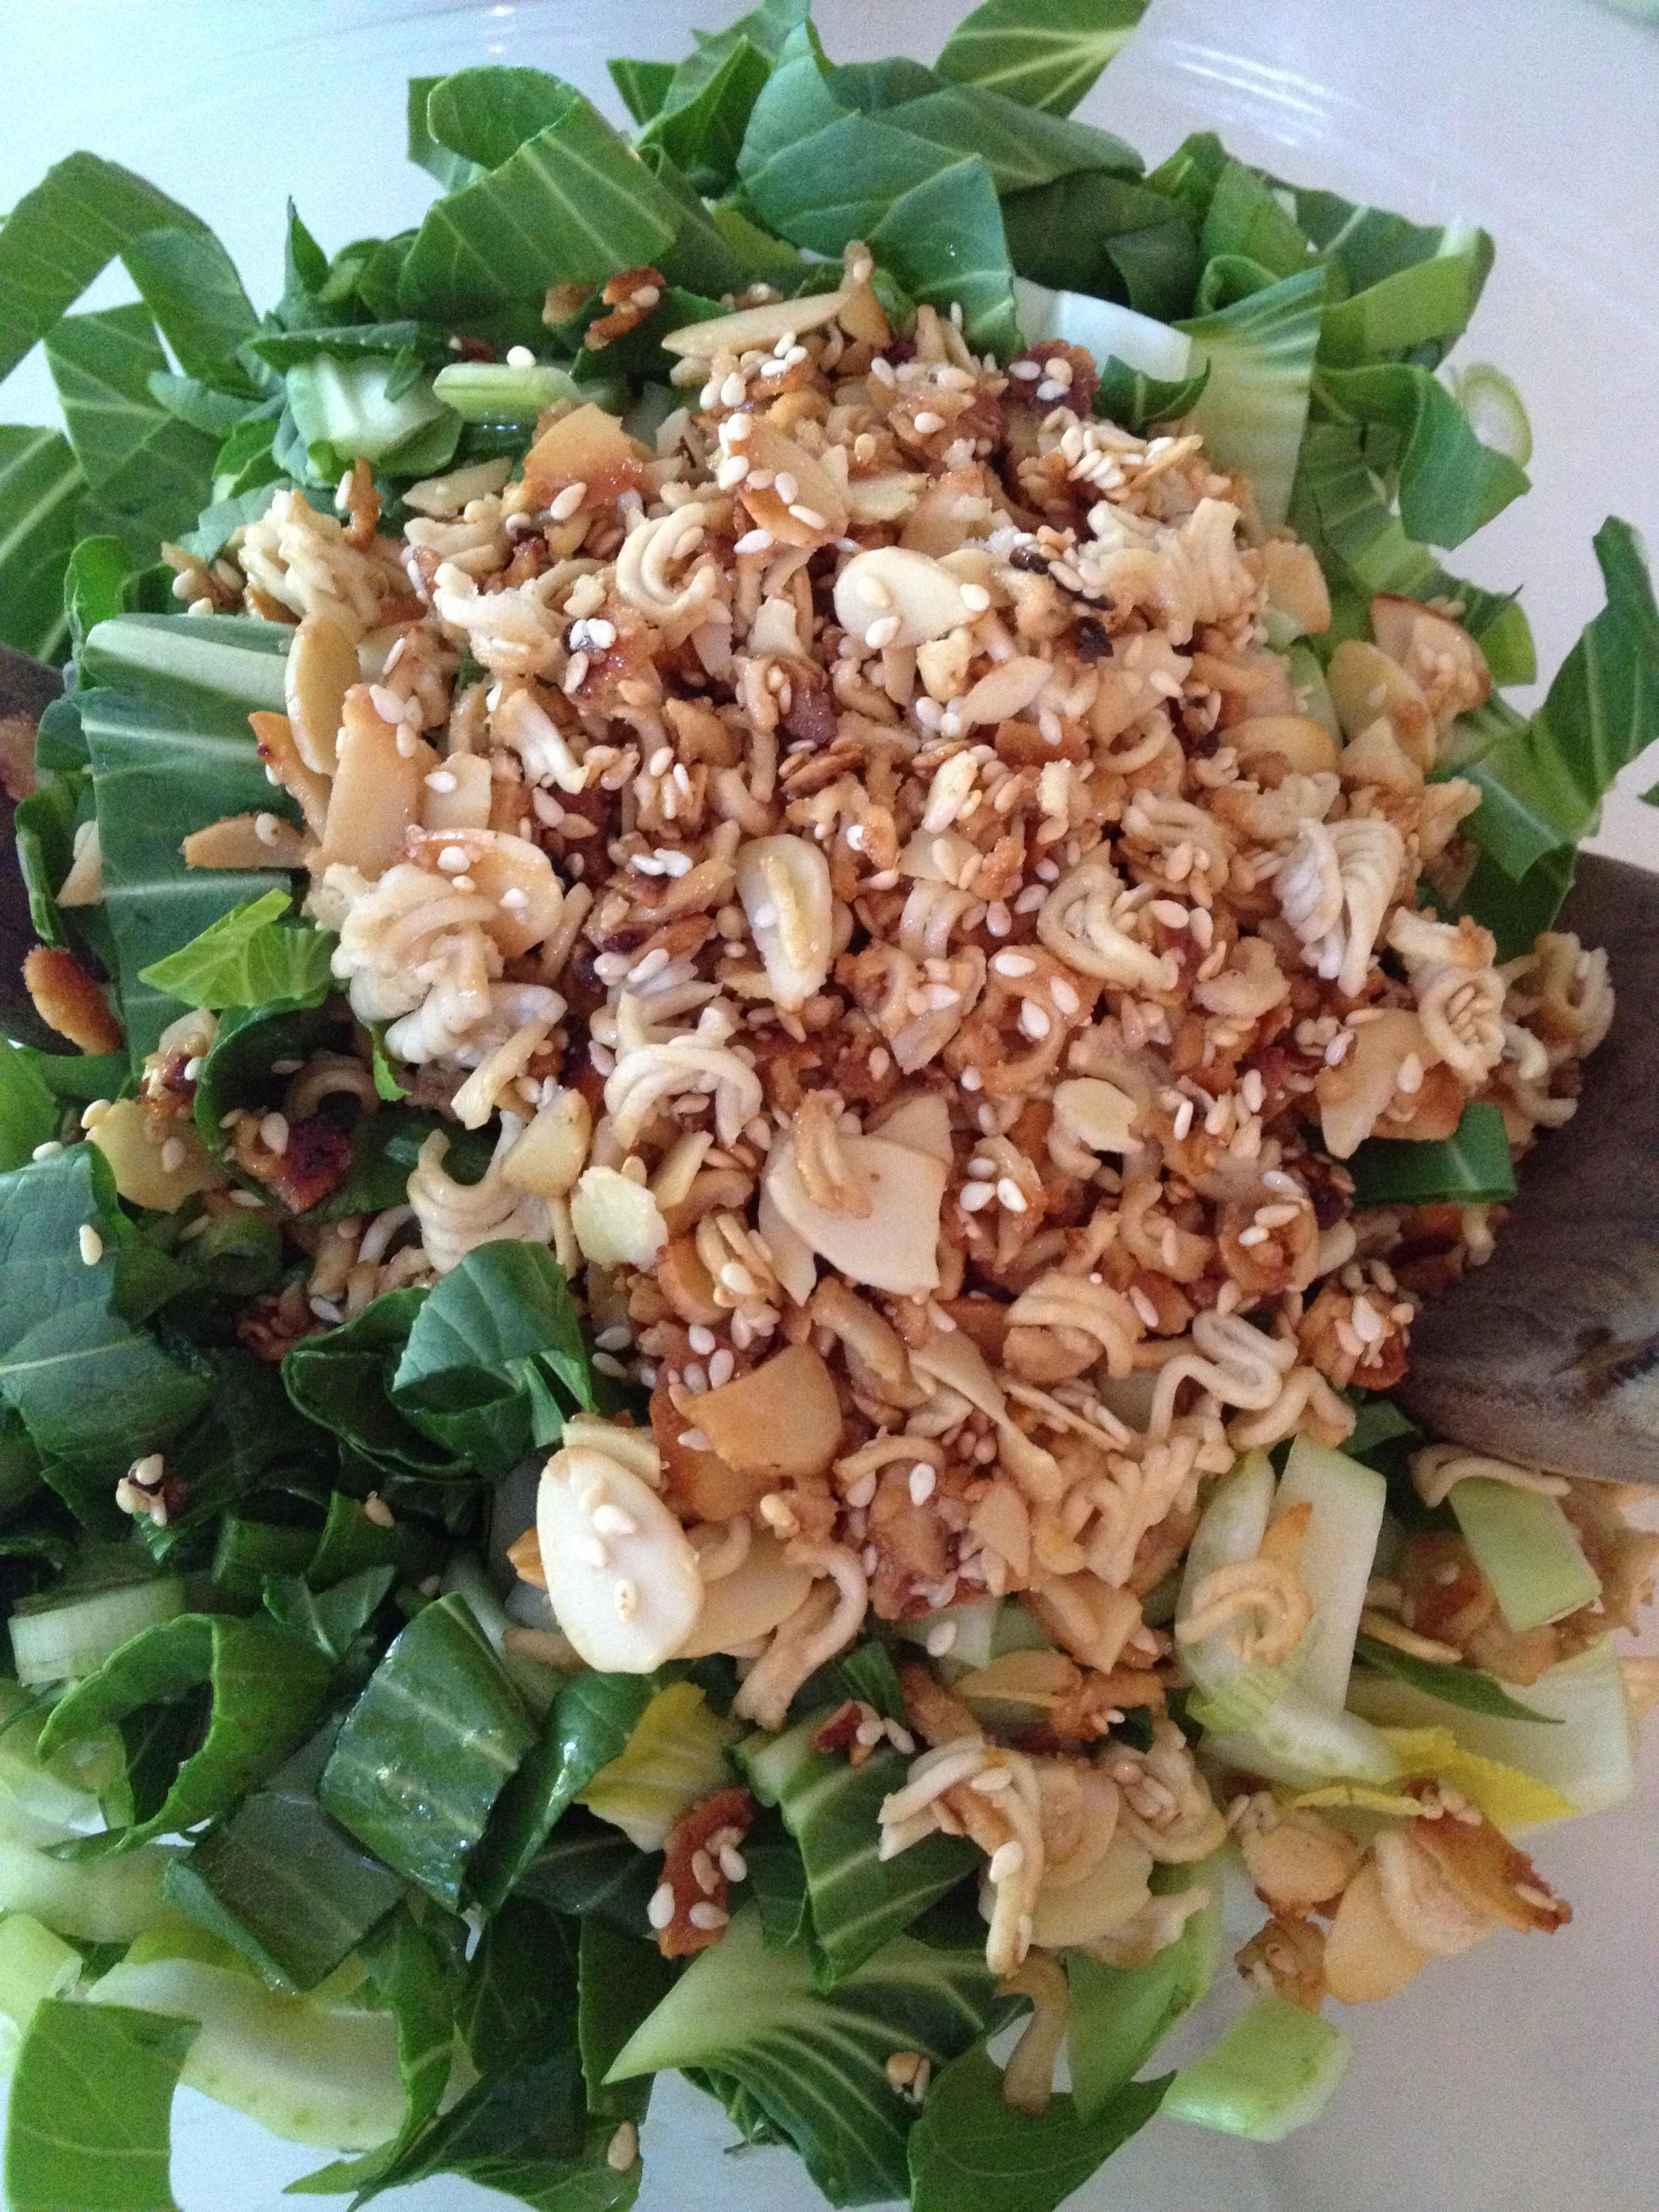 Baby Bok Choy Salad with Almond-Ramen Crunchies | Subee's Kitchen